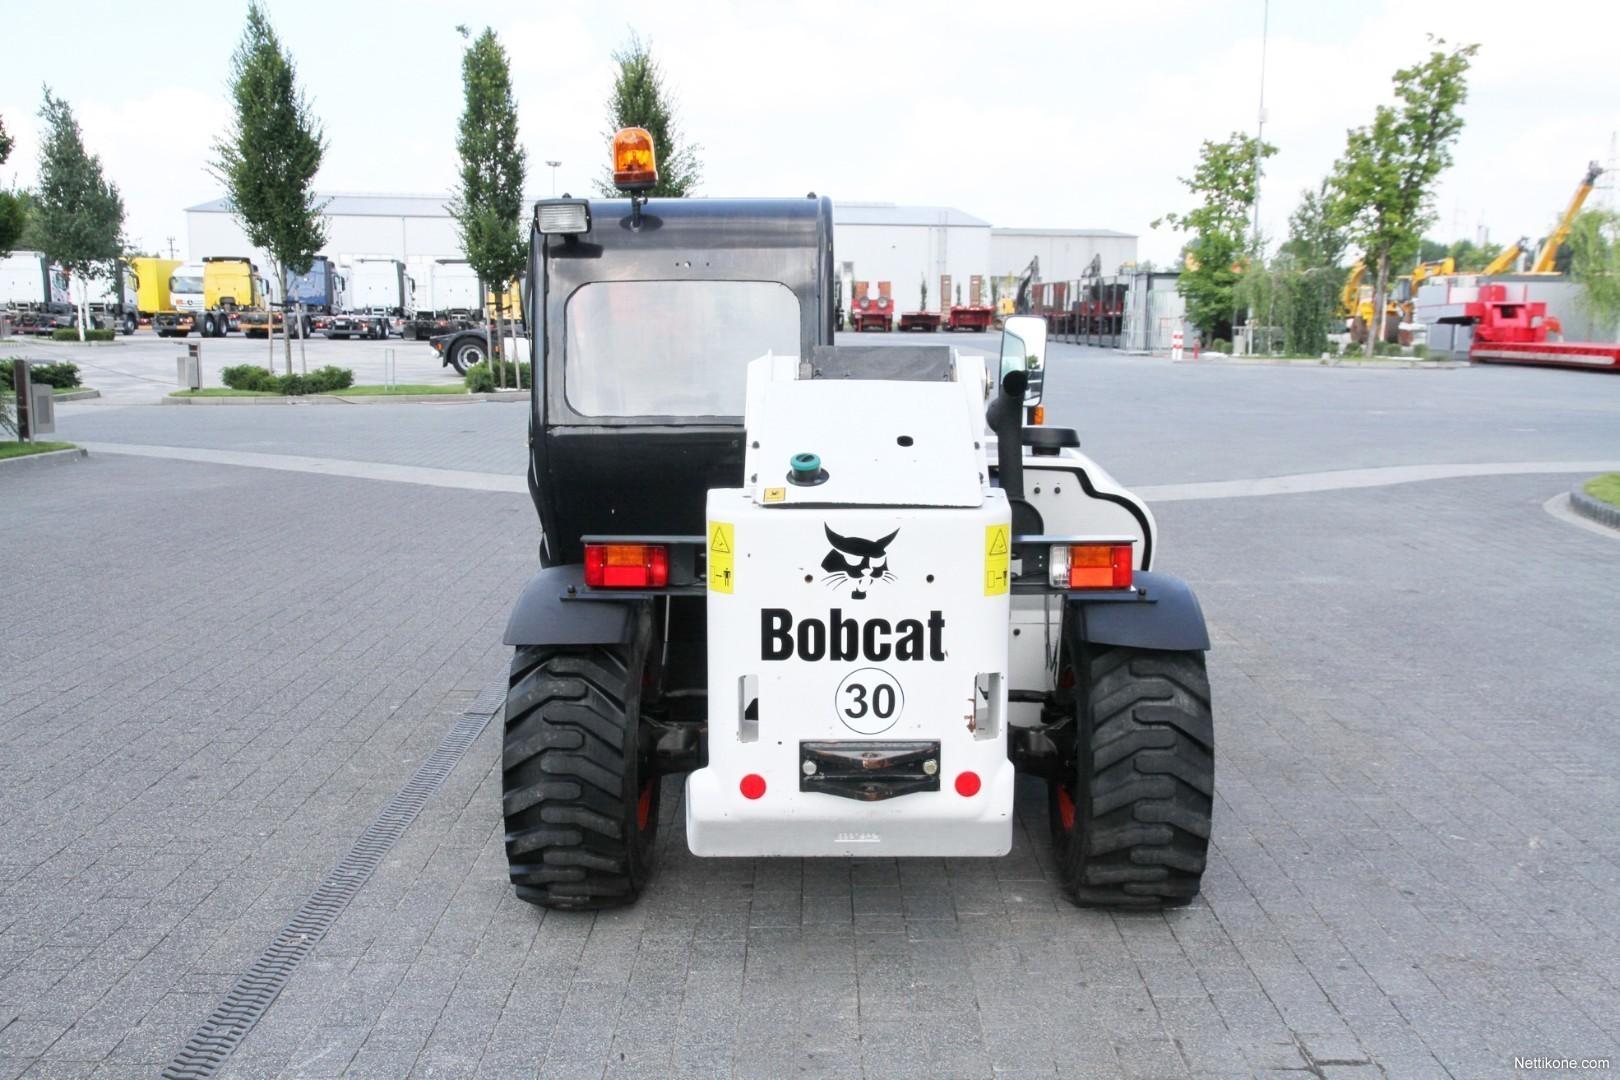 hight resolution of bobcat telescopic loader handler t2250 4x4x4 5 m 250 mth new